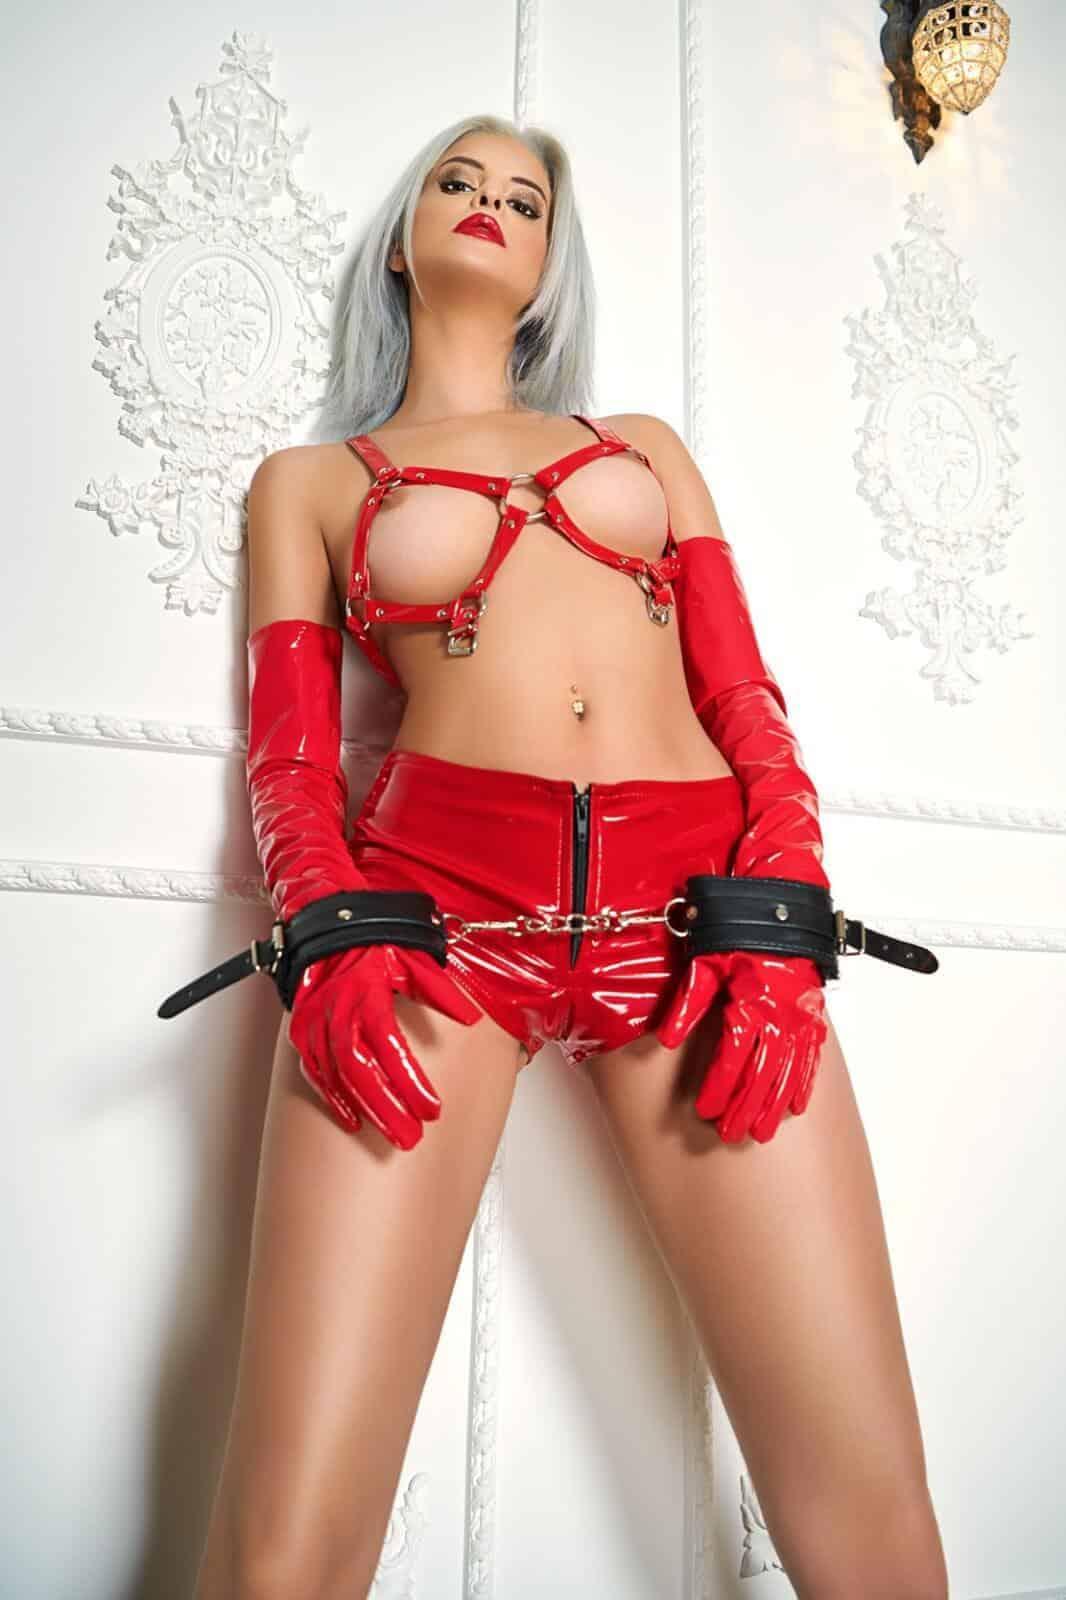 cezy_london_escort-1604507069-759-e